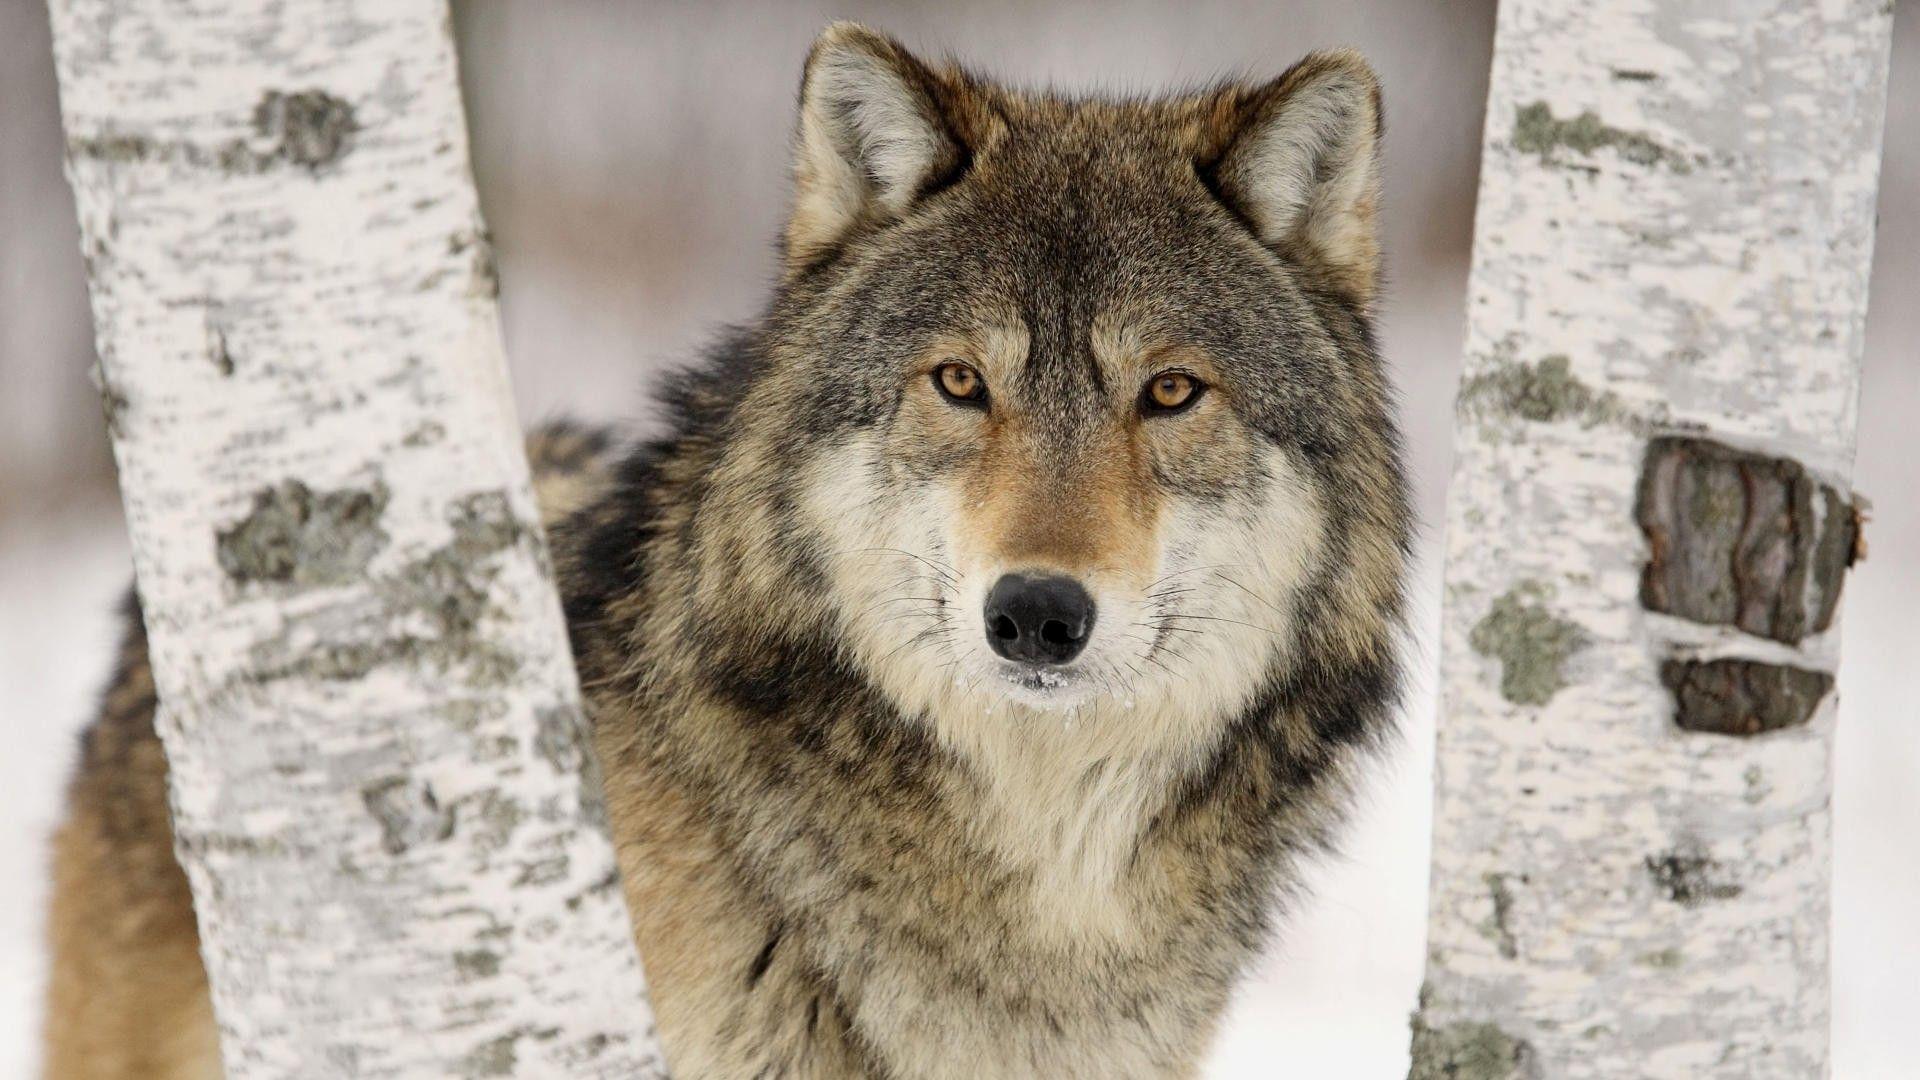 HD Wolf Wallpapers - Wallpaper Cave Wallpaper Hd Wolf